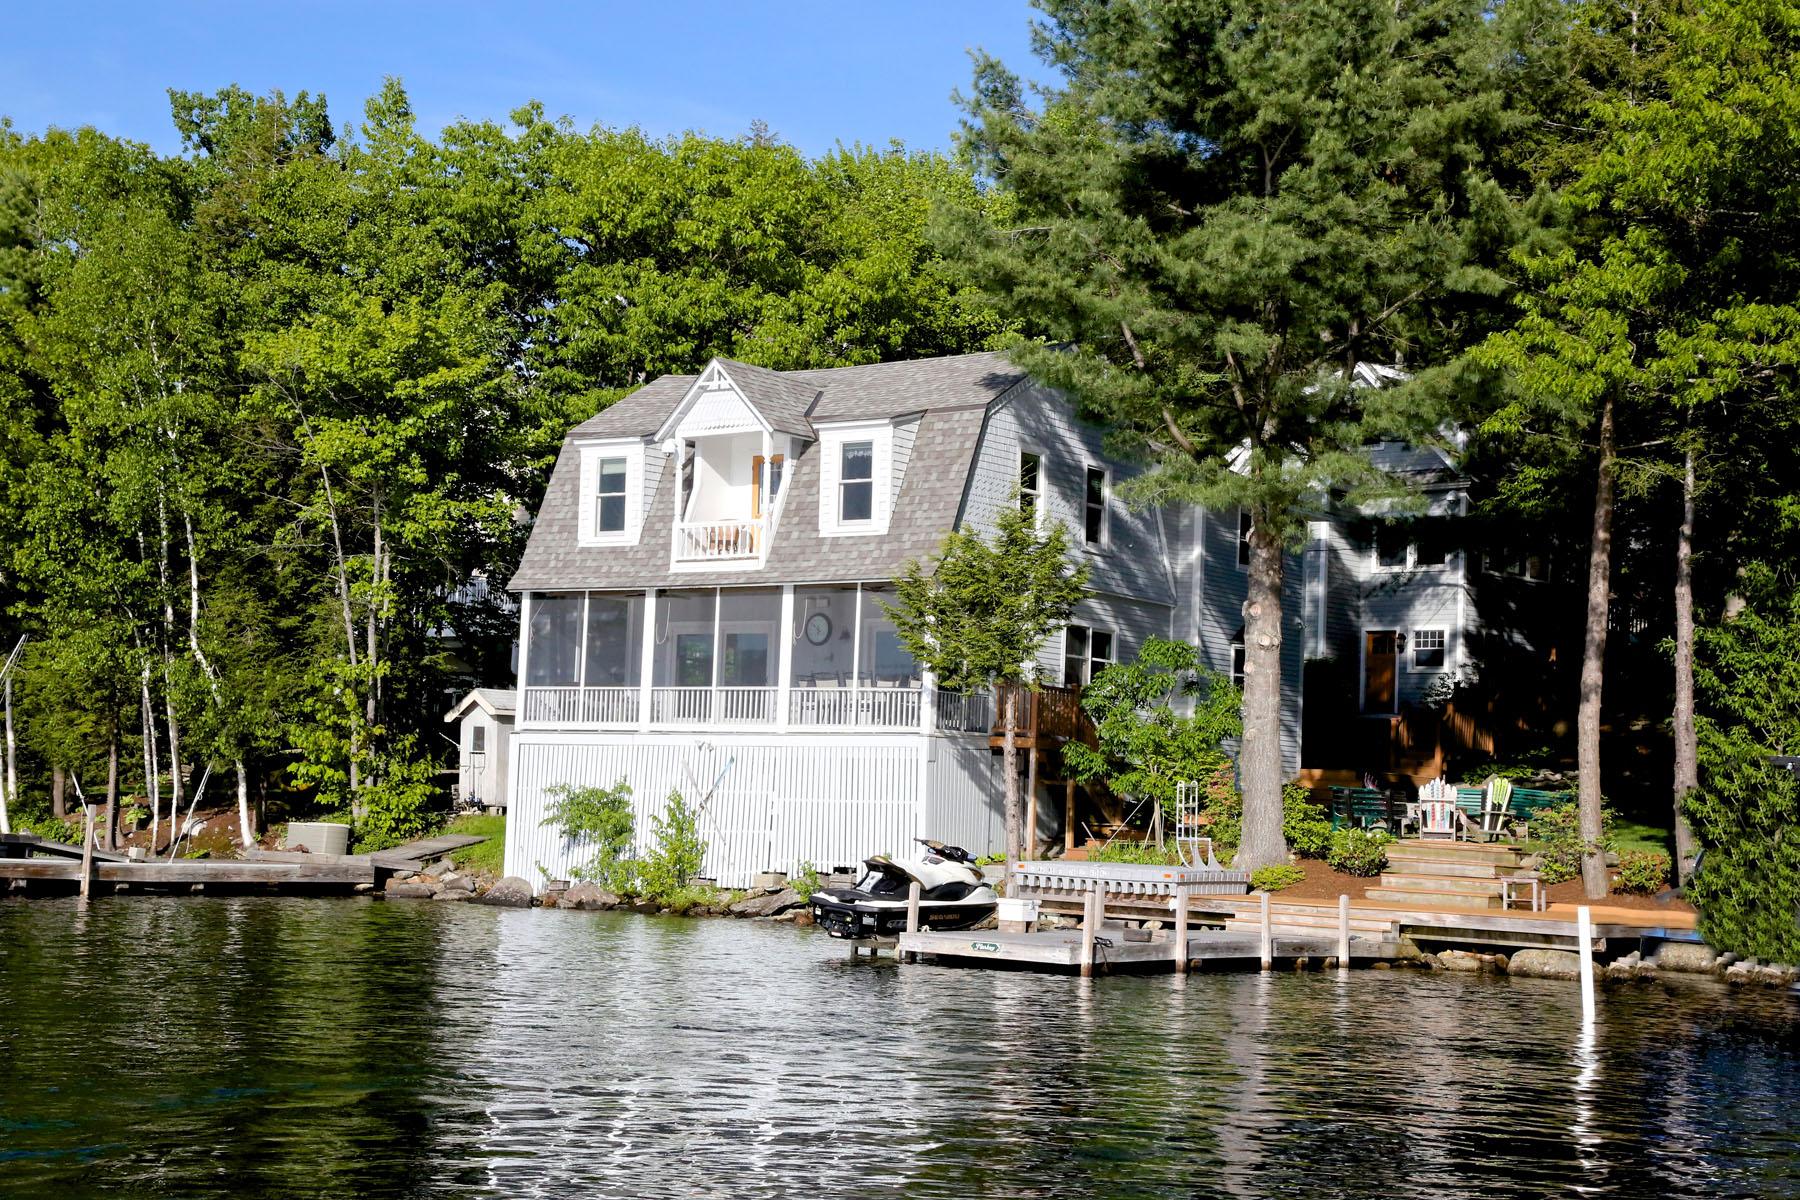 Single Family Home for Sale at Charming Lake Sunape 95 Lake Ave Sunapee, New Hampshire 03782 United States